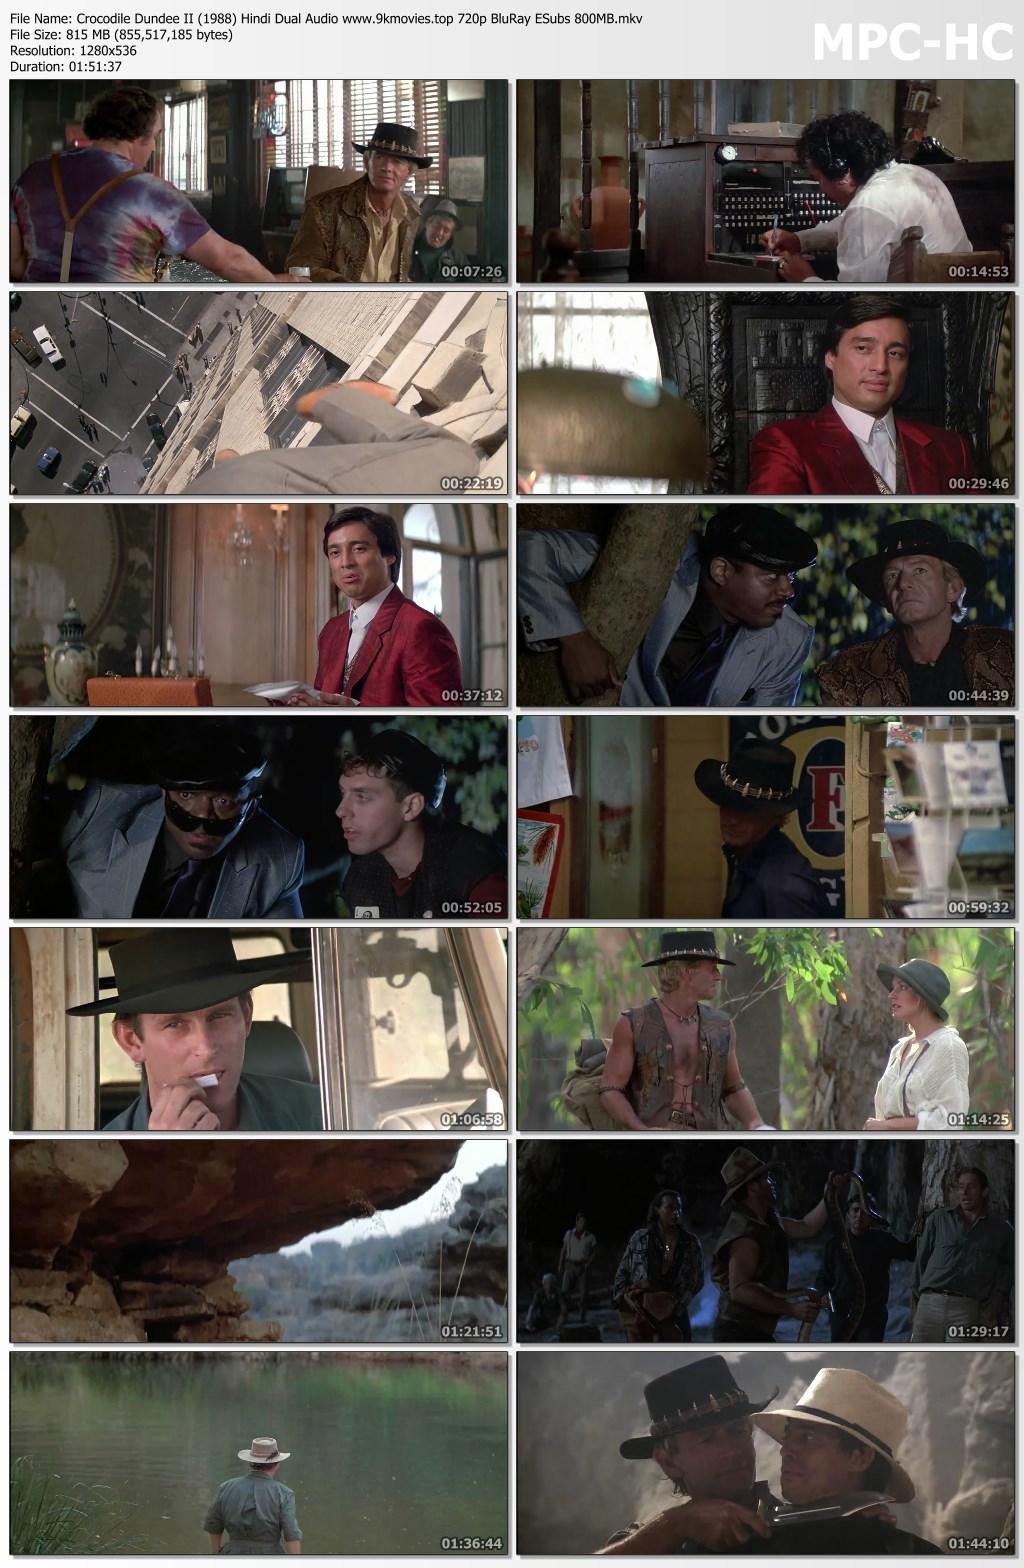 Crocodile Dundee Ii 1988 Hindi Dual Audio 720p Bluray Esubs 810mb Download 9xmovies Chat